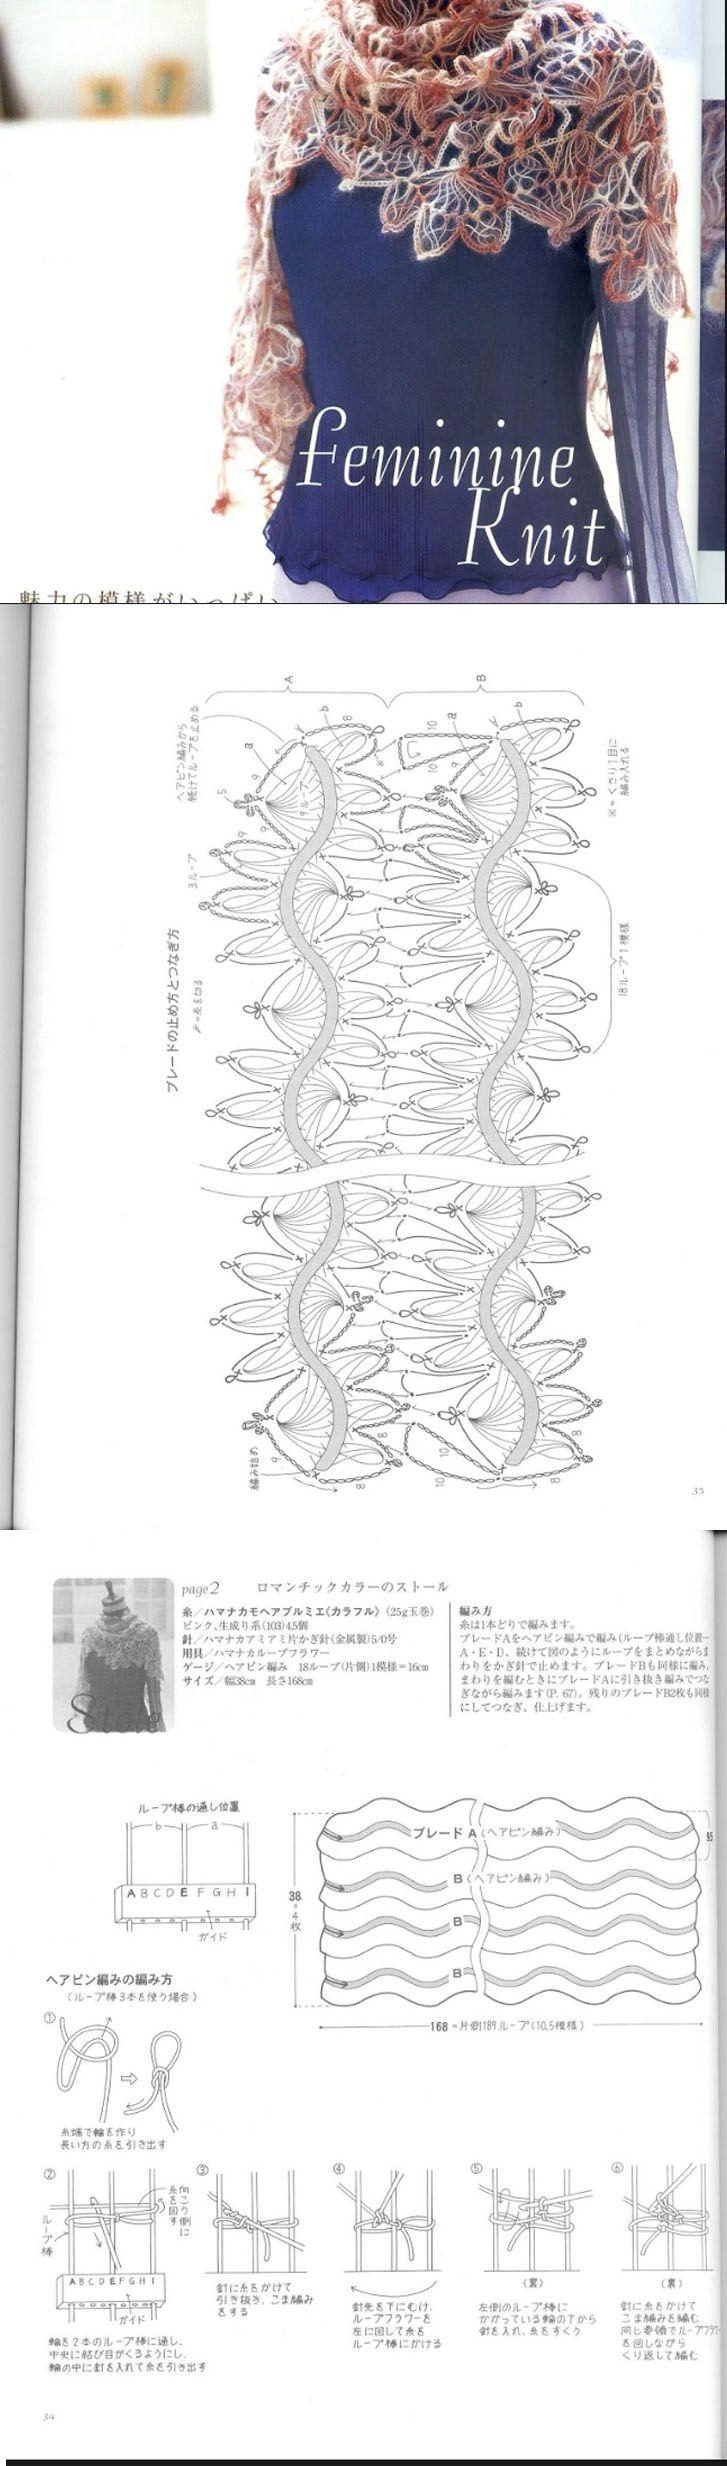 shawl - guimpe haken - hairpin lace crochet